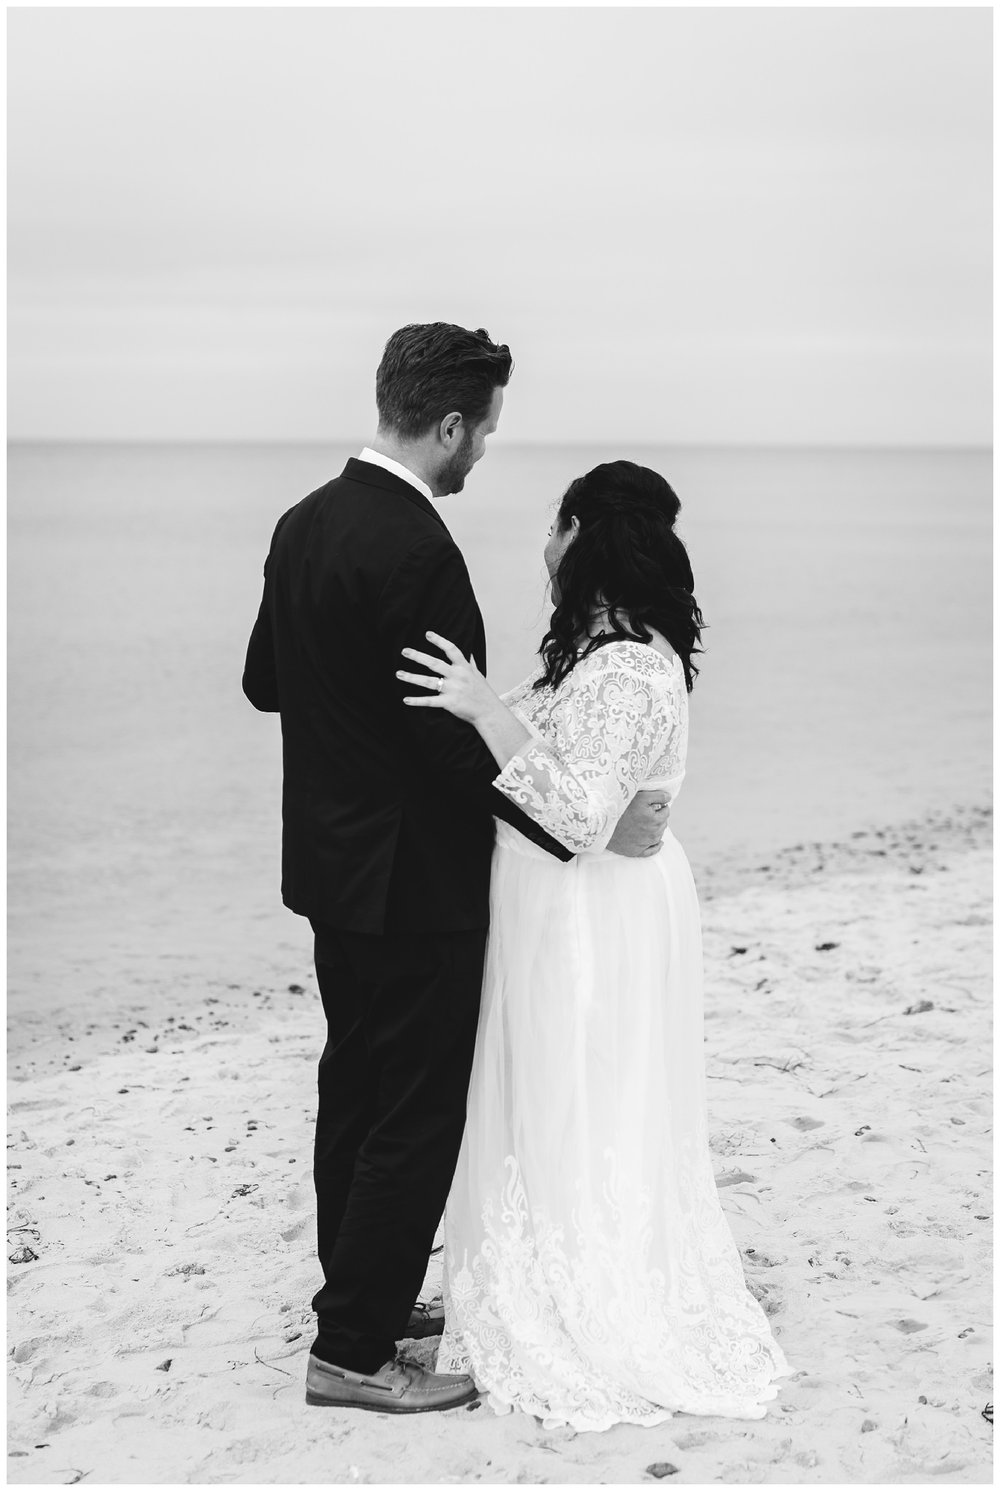 Intimate Beach Wedding Cape Cod Wedding Photographer Yarmouth MA-110.jpg